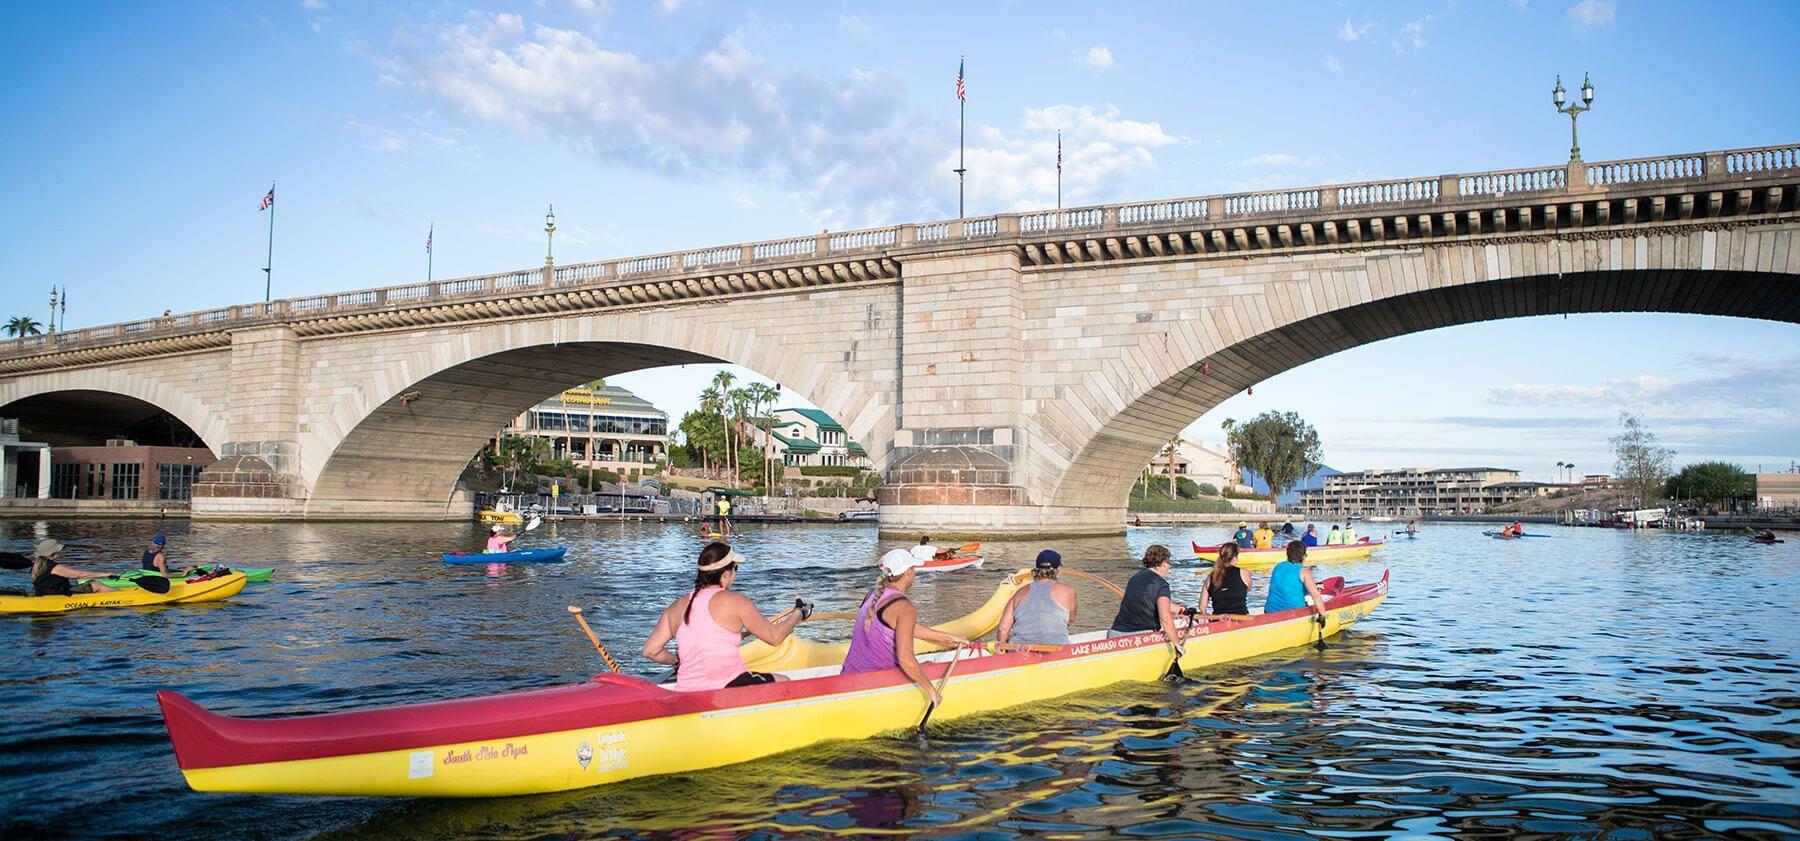 Rowing under the london bridge lake havasu city az